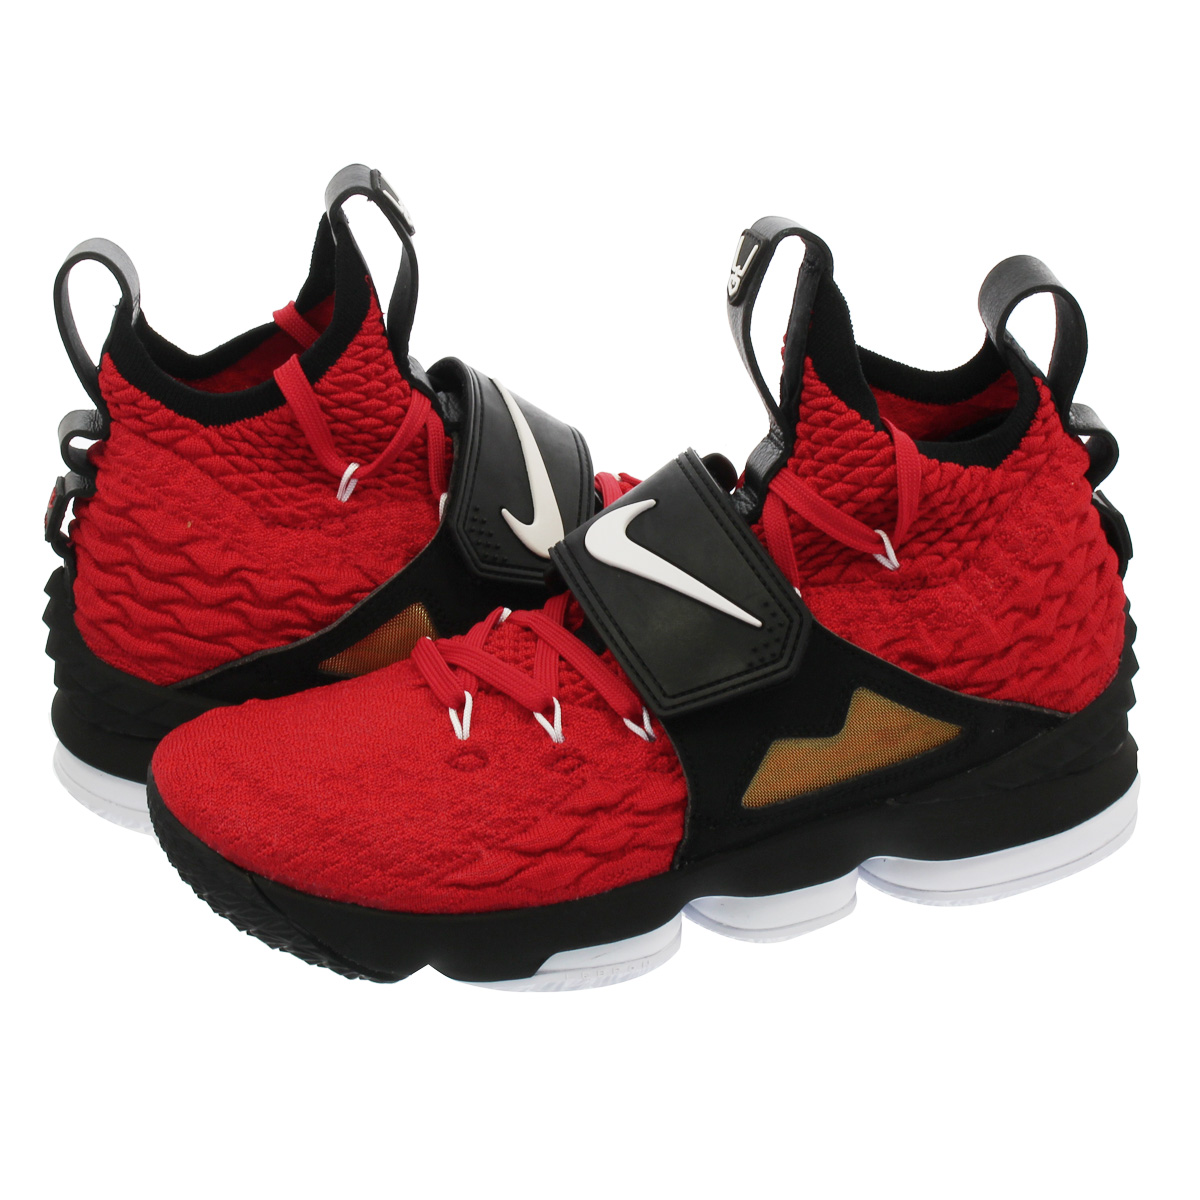 half off d6396 3e1cb NIKE LEBRON 15 Nike Revlon 15 UNIVERSITY RED/WHITE/BLACK ao9144-600